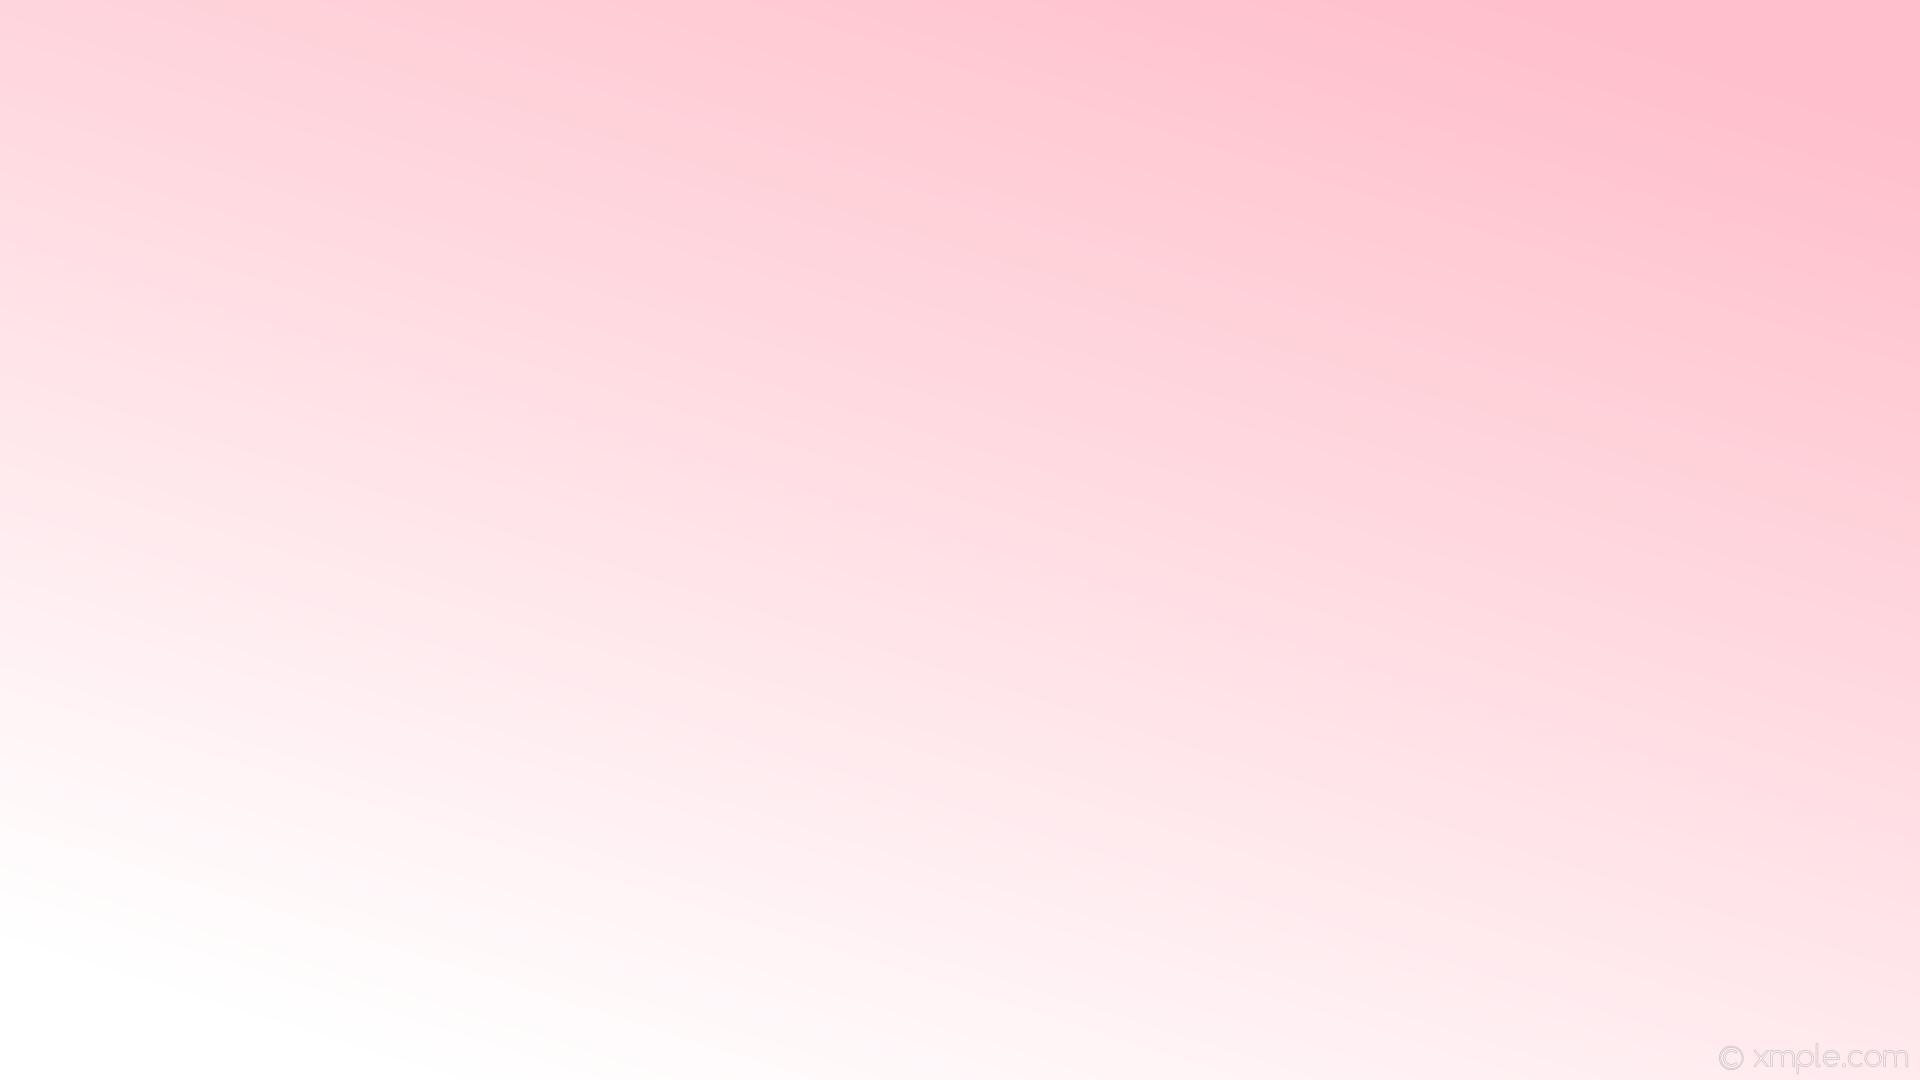 wallpaper gradient white pink linear #ffffff #ffc0cb 225°